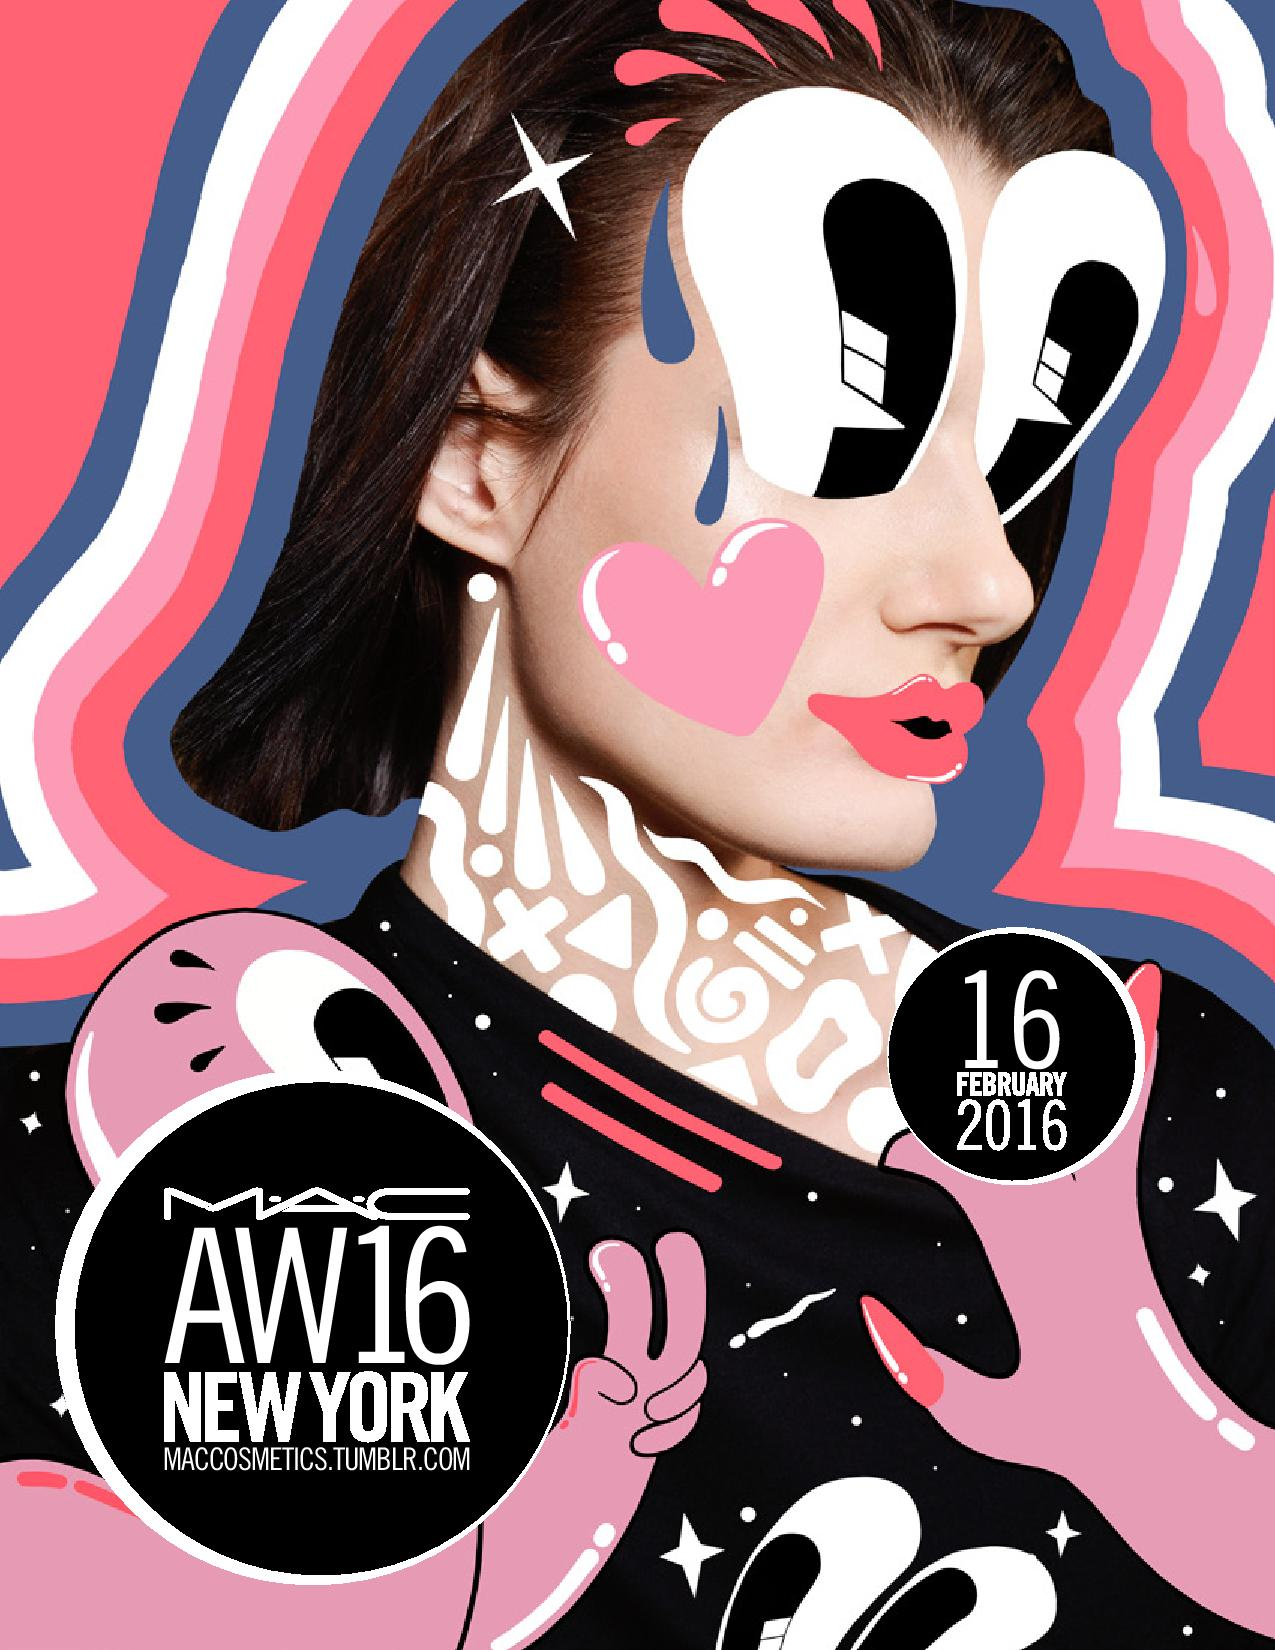 AW16_DAILY FACECHART_NEW YORK_FEB 16 (Ohne Titel, Oscar de la Renta)-page-001